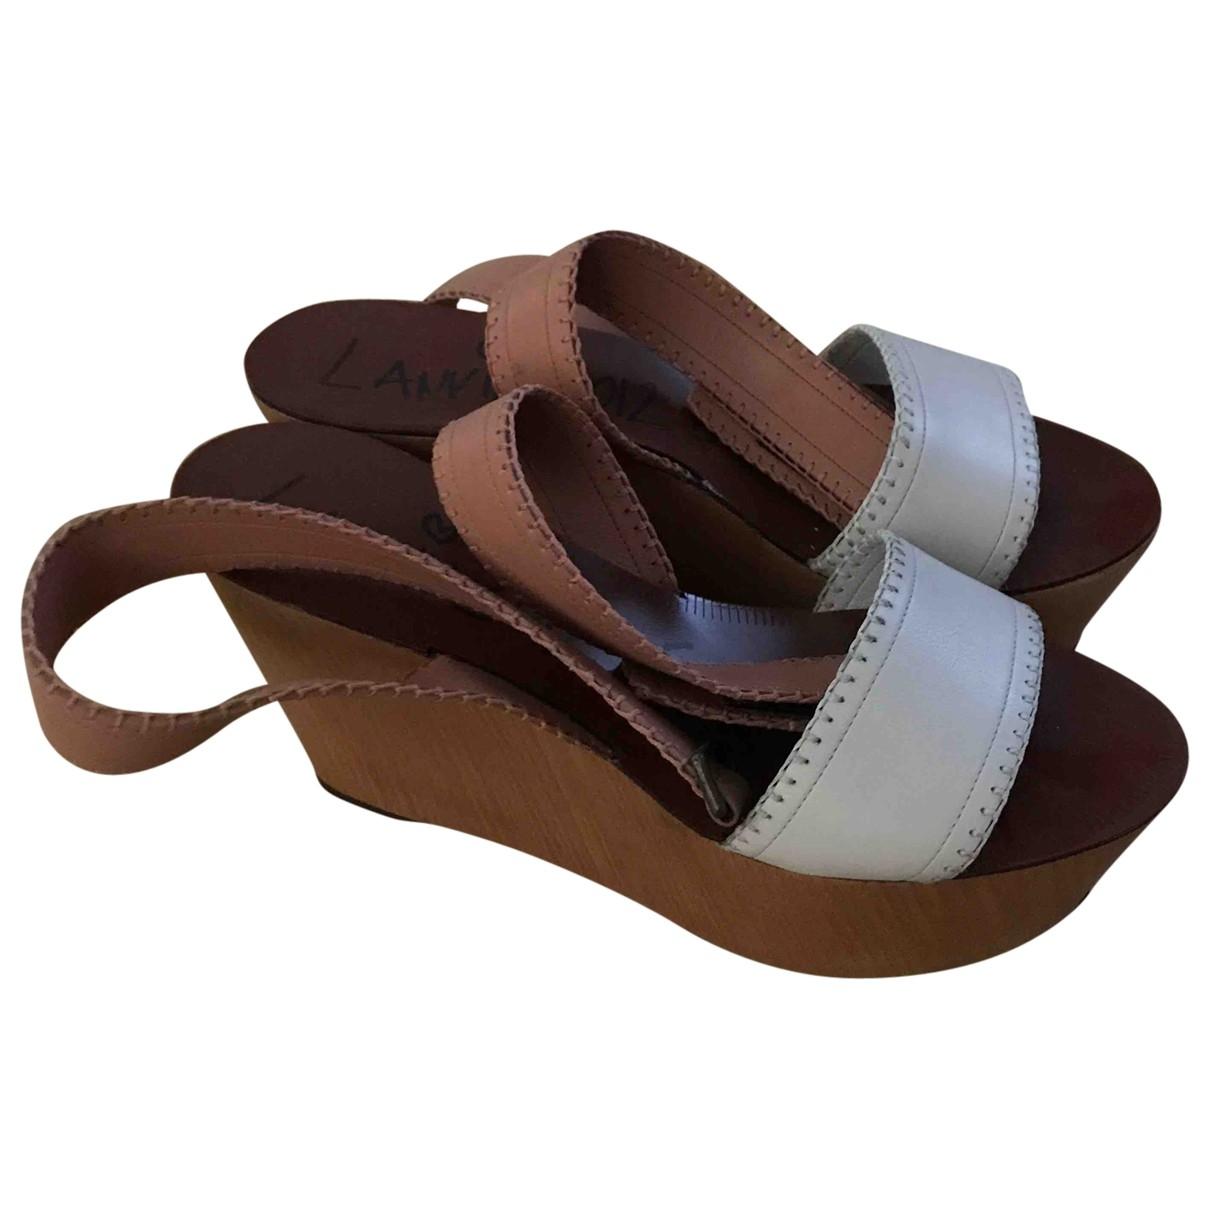 Lanvin \N Beige Leather Sandals for Women 41 EU